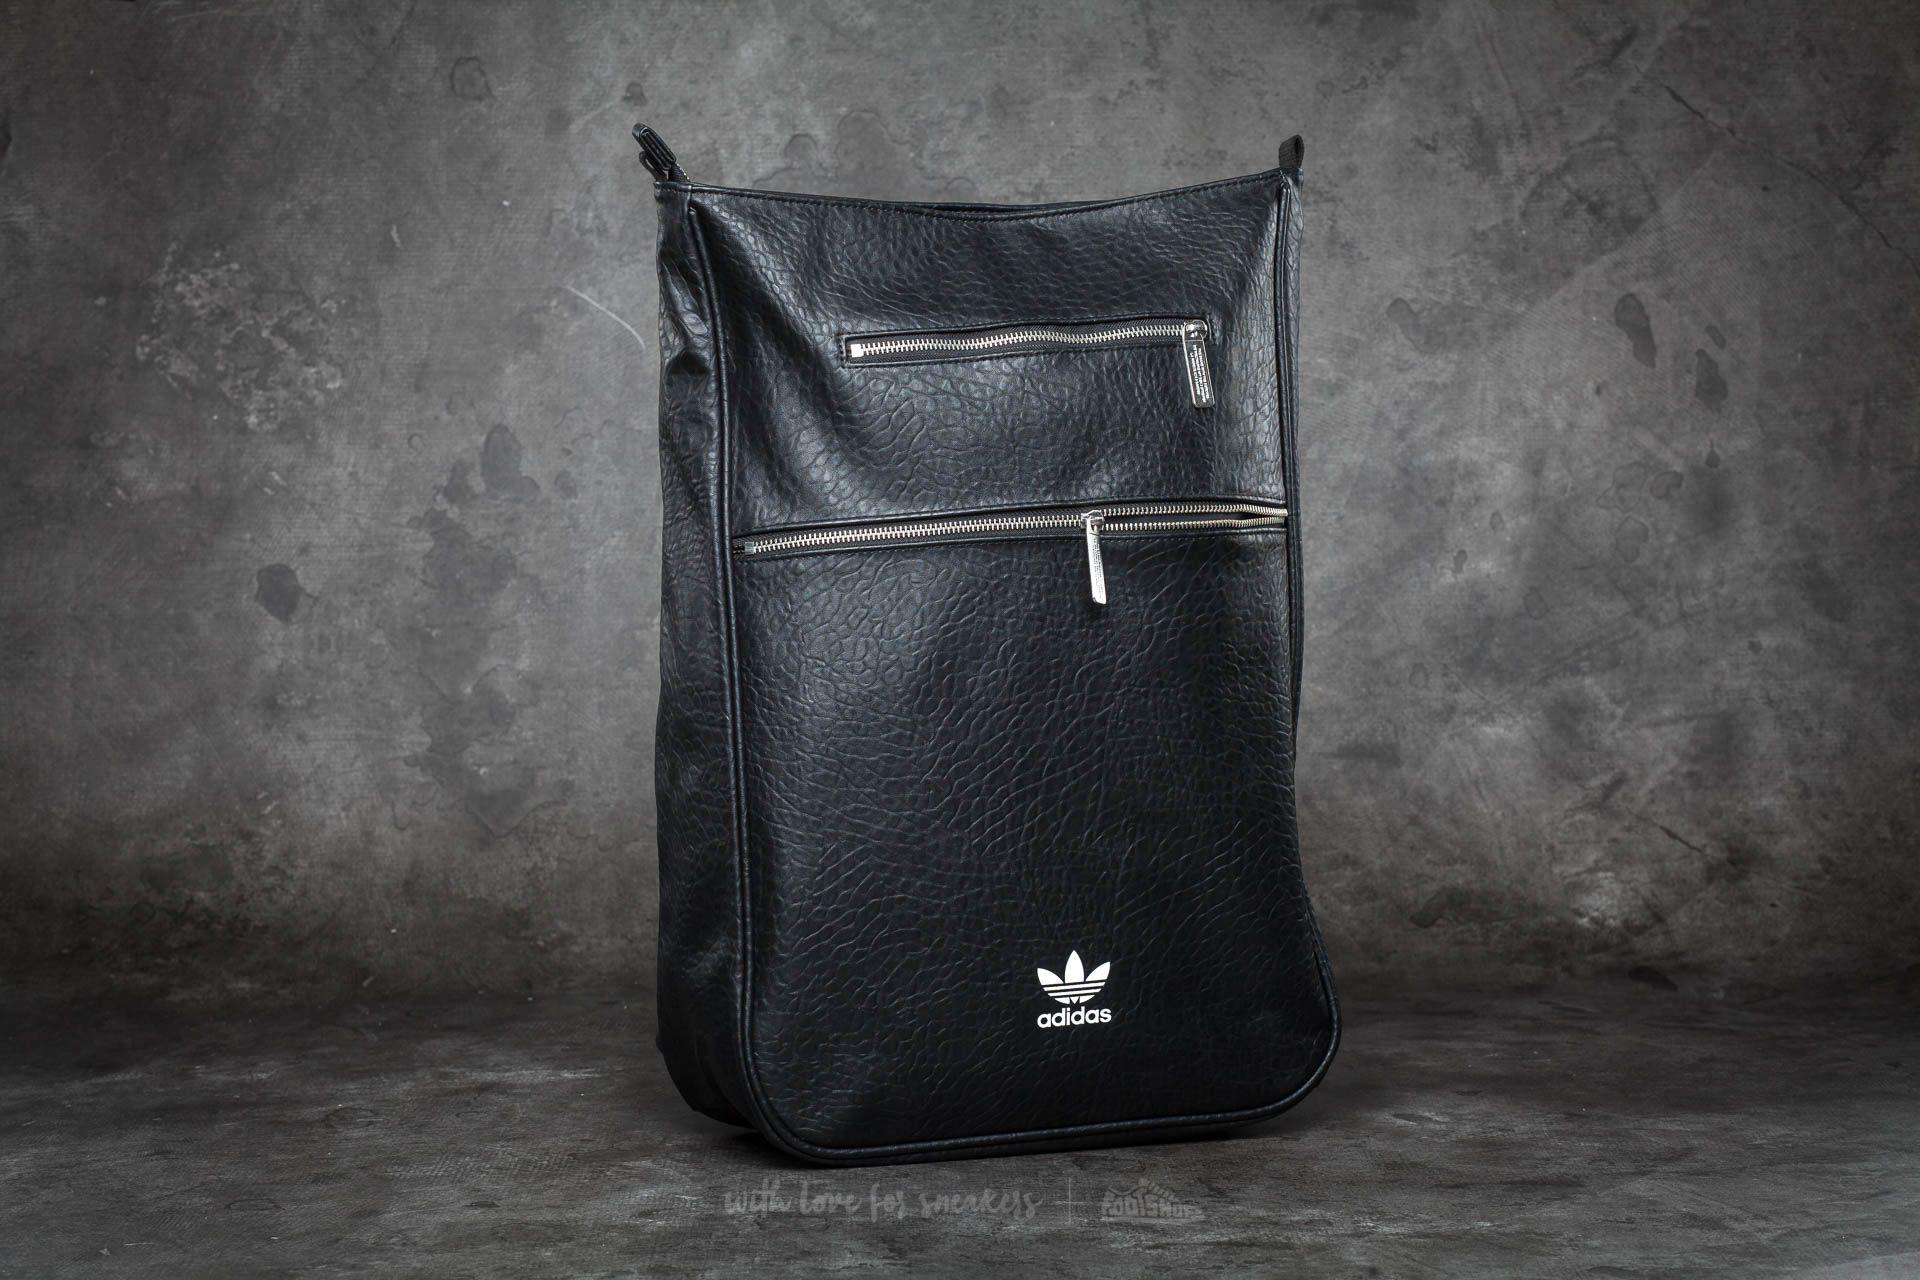 97b11f3136a9 adidas Top Backpack Black